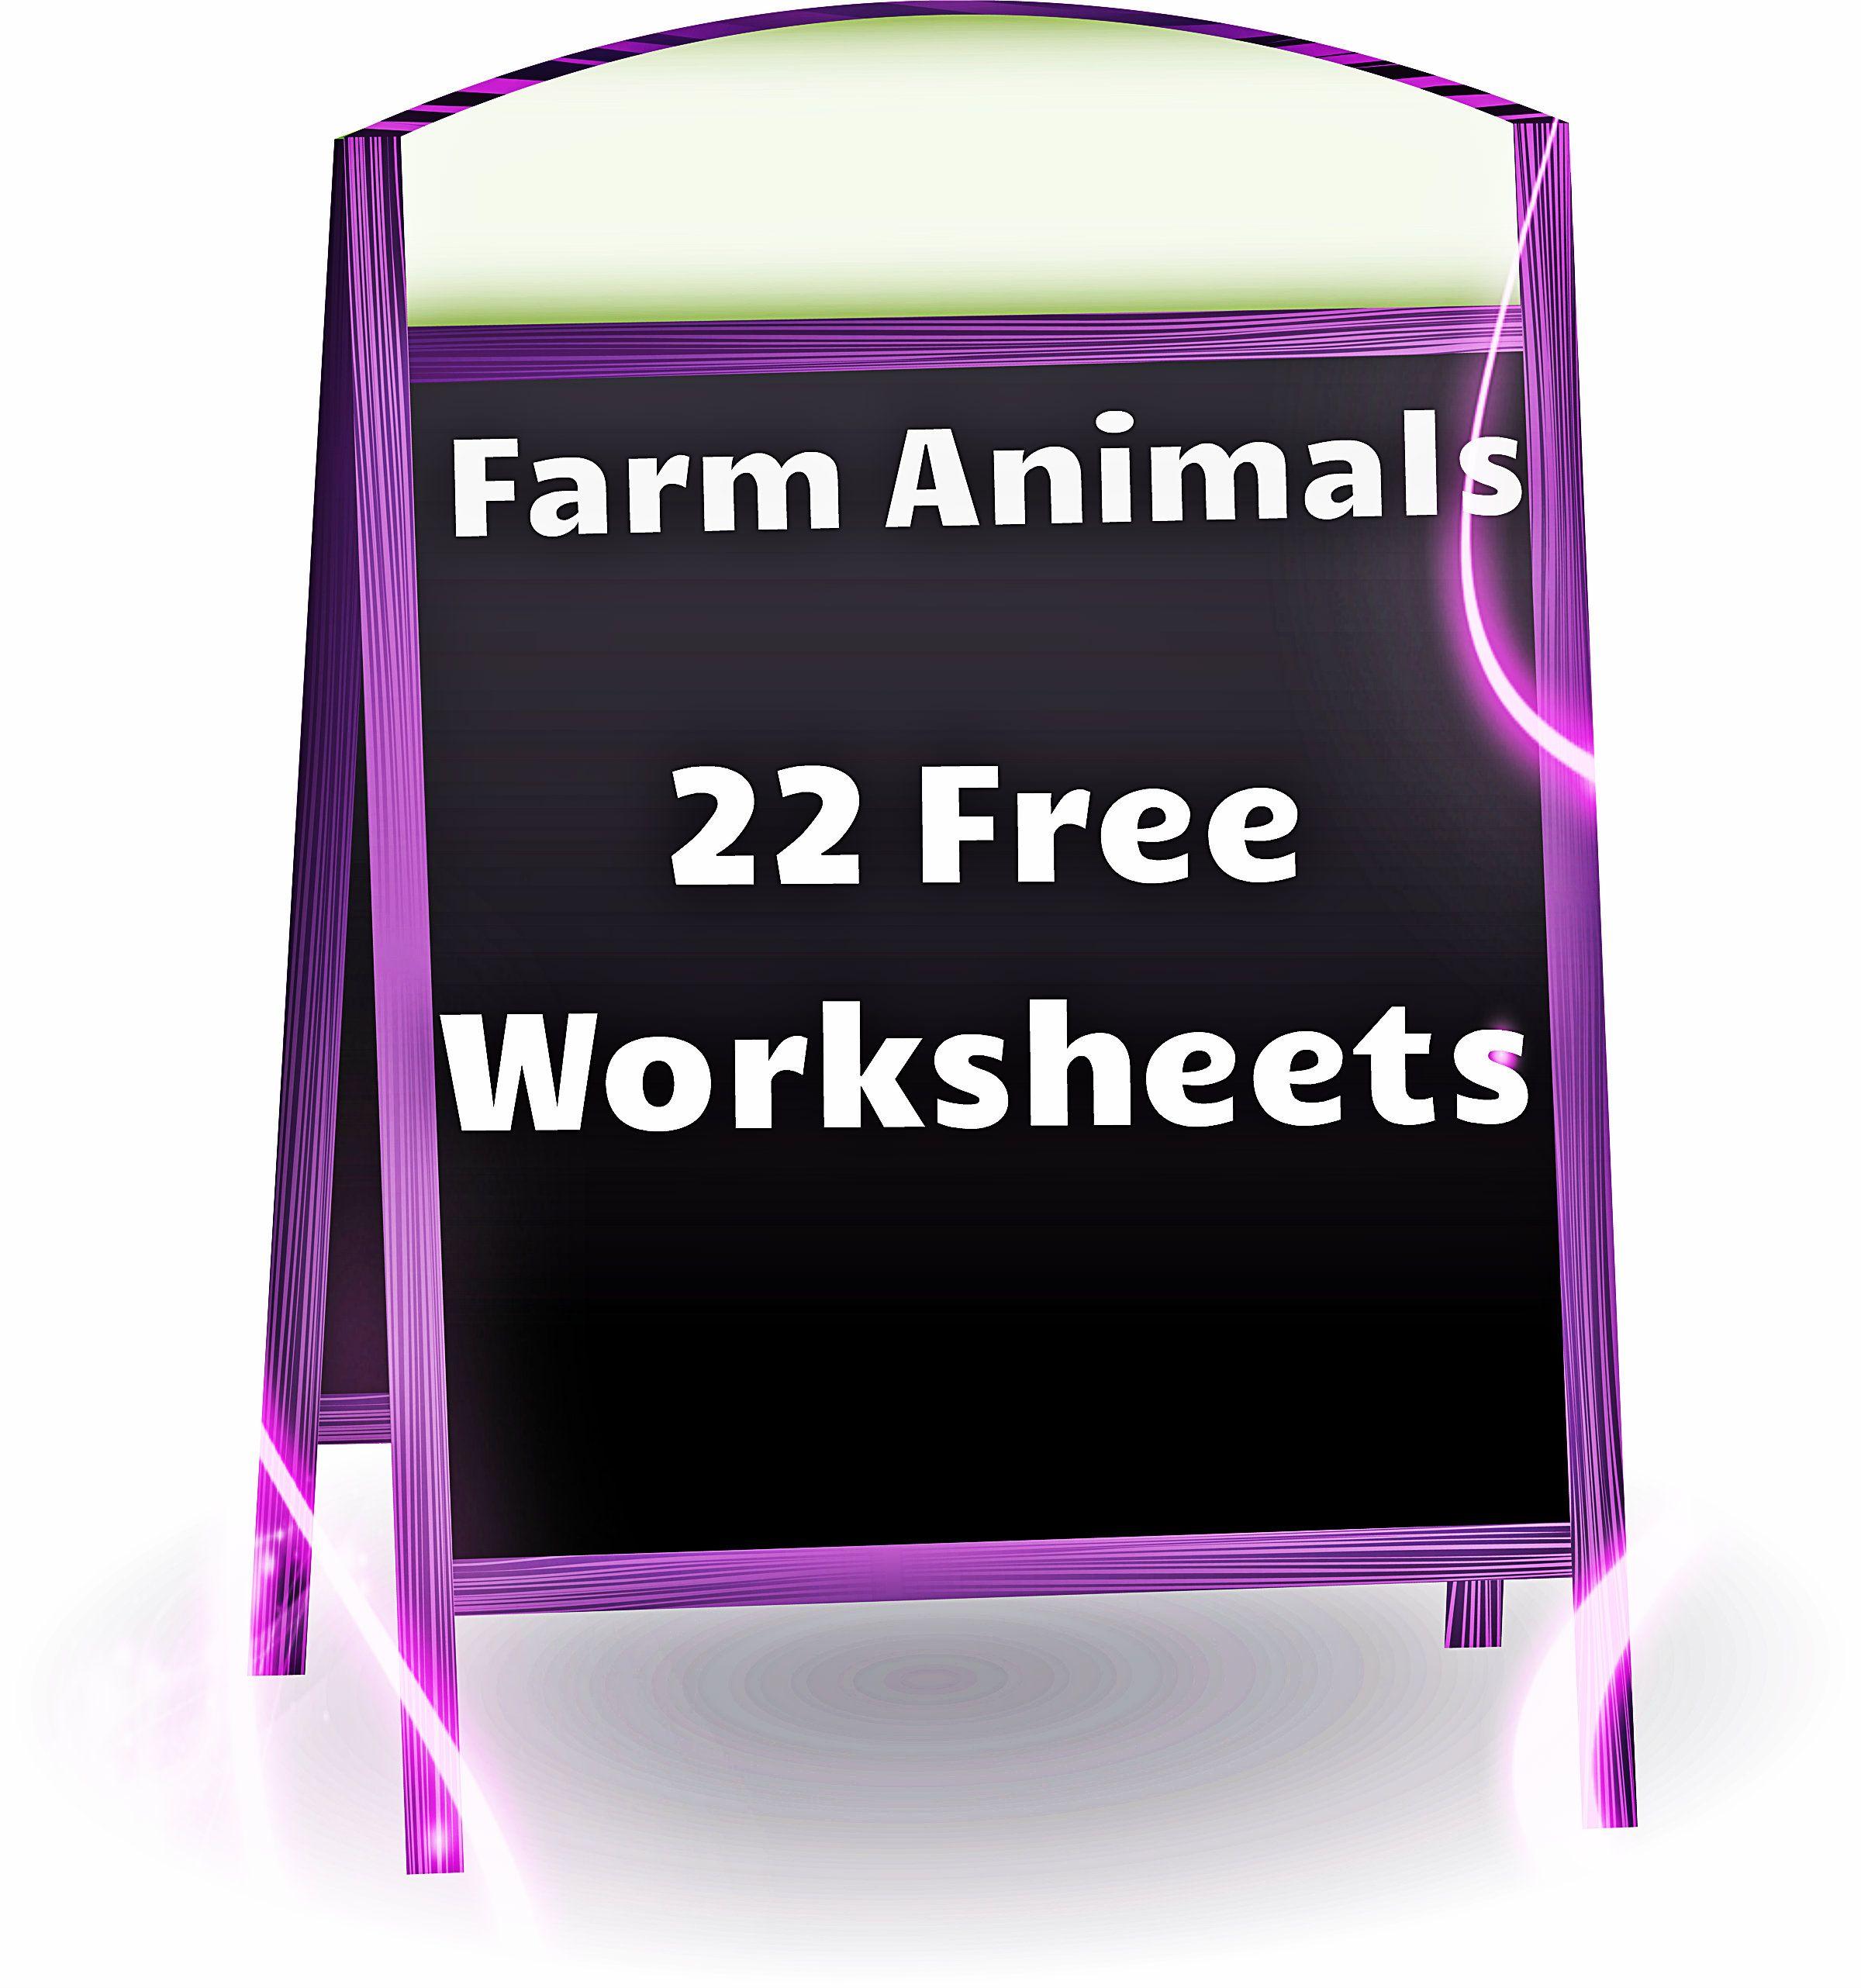 Farm Animals Free Worksheets